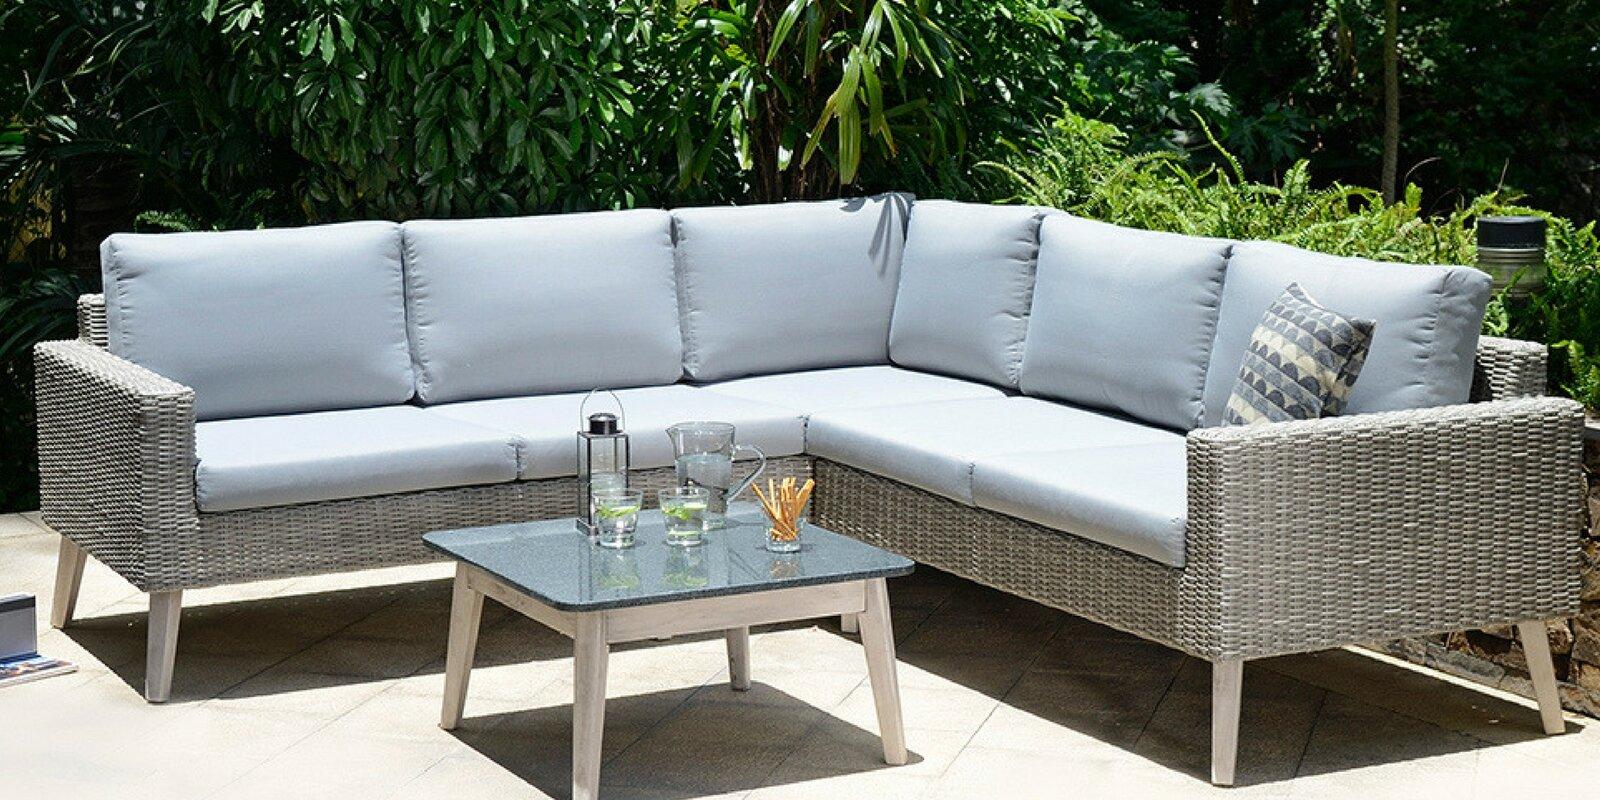 Dayne 6 Seater Rattan Corner Sofa Set With Cushions